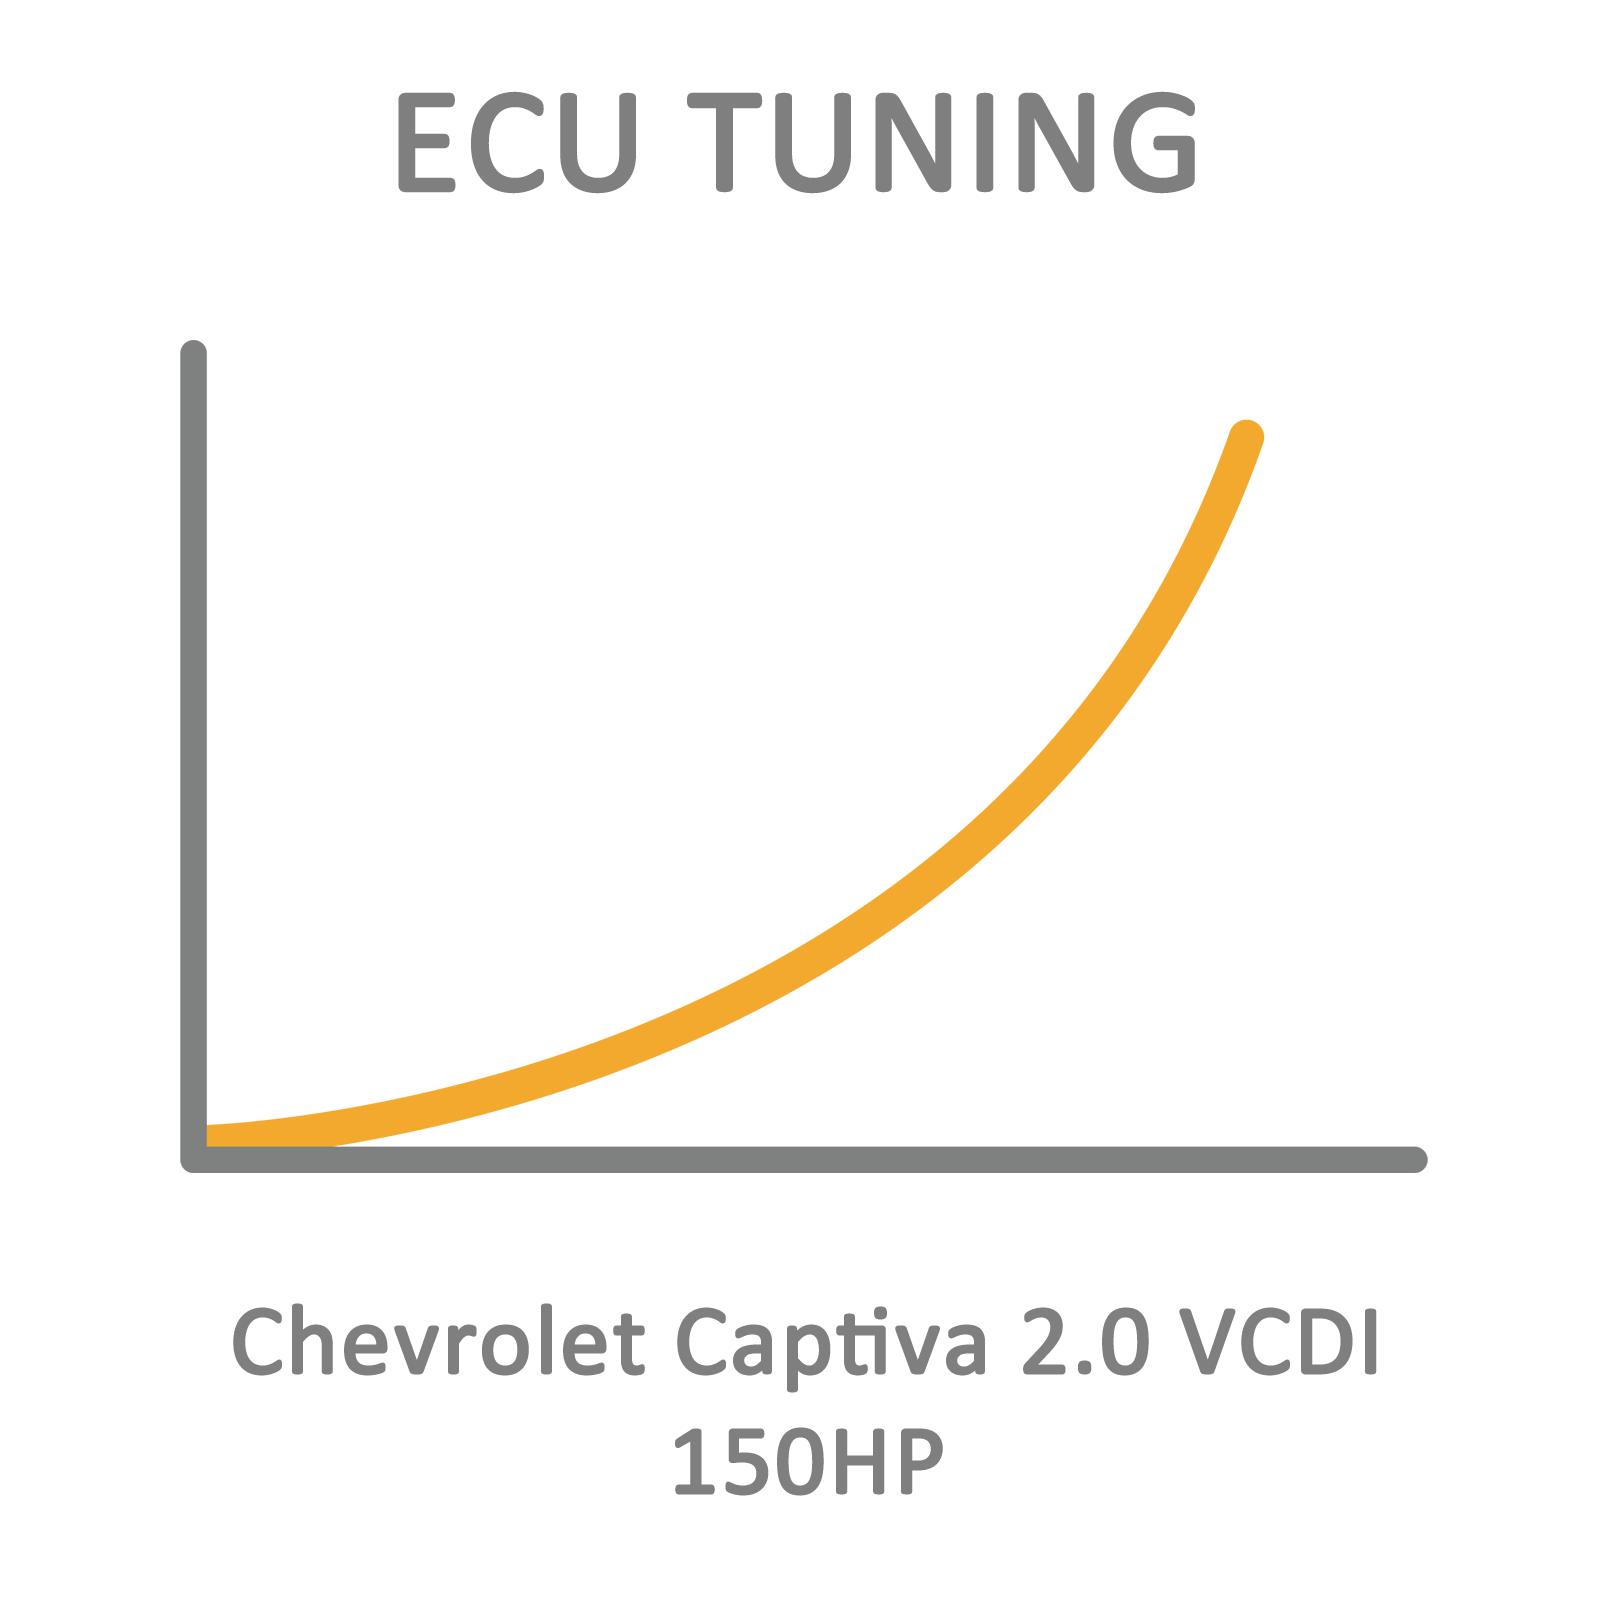 Chevrolet Captiva 2.0 VCDI 150HP ECU Tuning Remapping